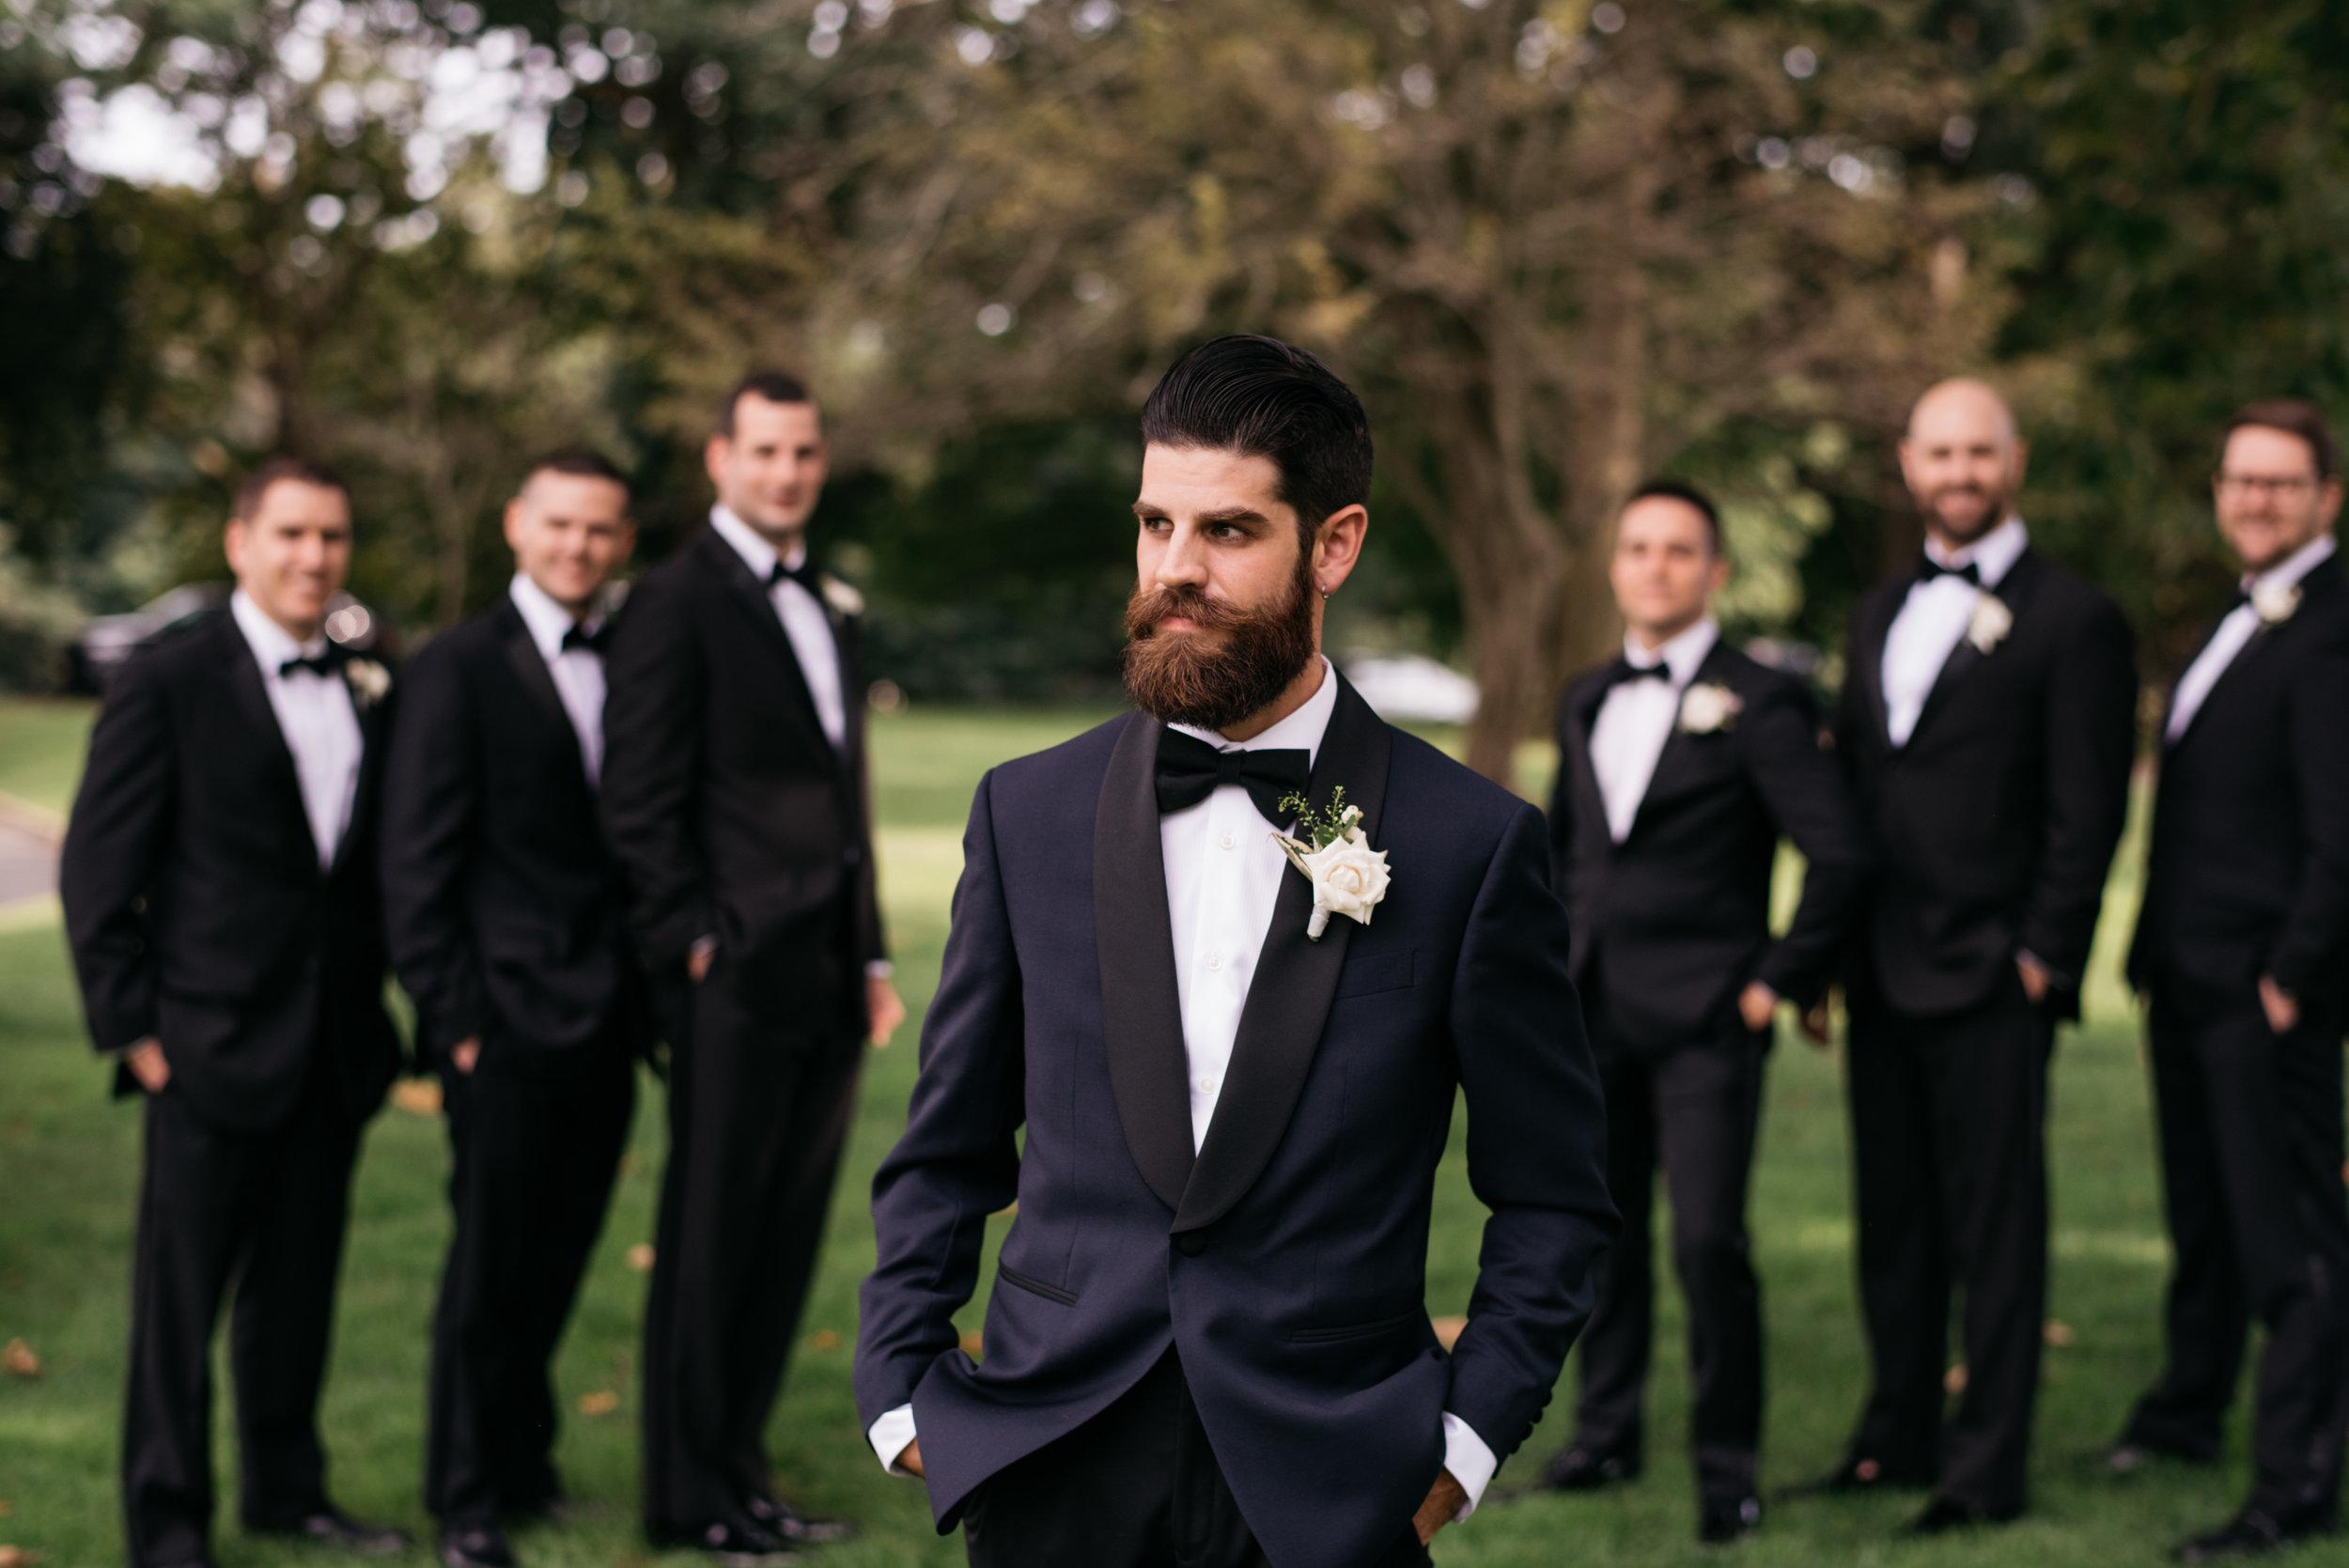 WeddingPhotos | NJPhotographer | Highlights-13-4.jpg